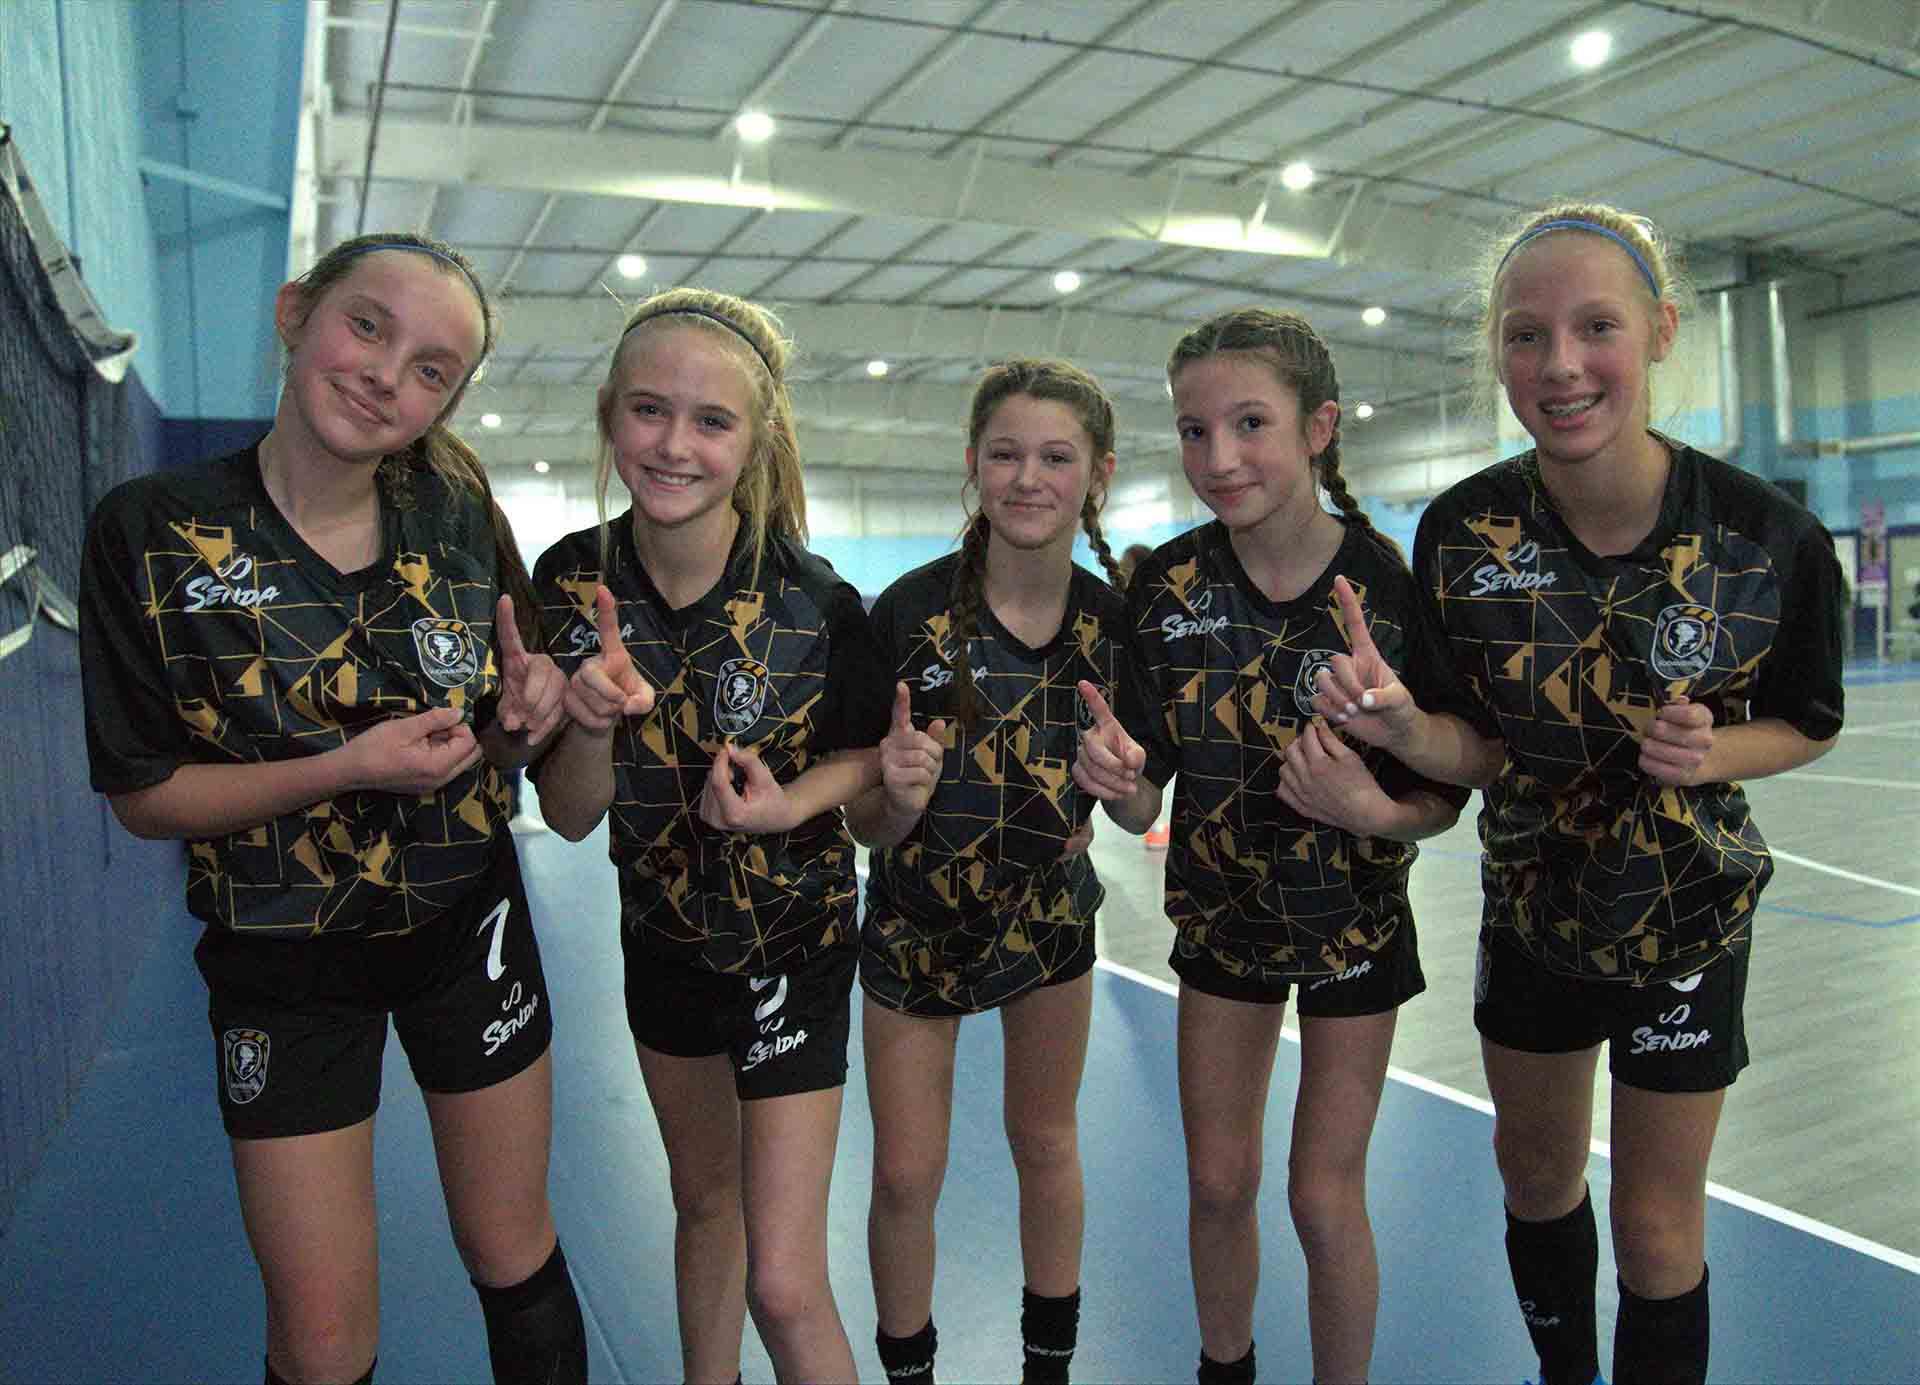 Sudamerica Futsal girls team with Senda customized home uniform